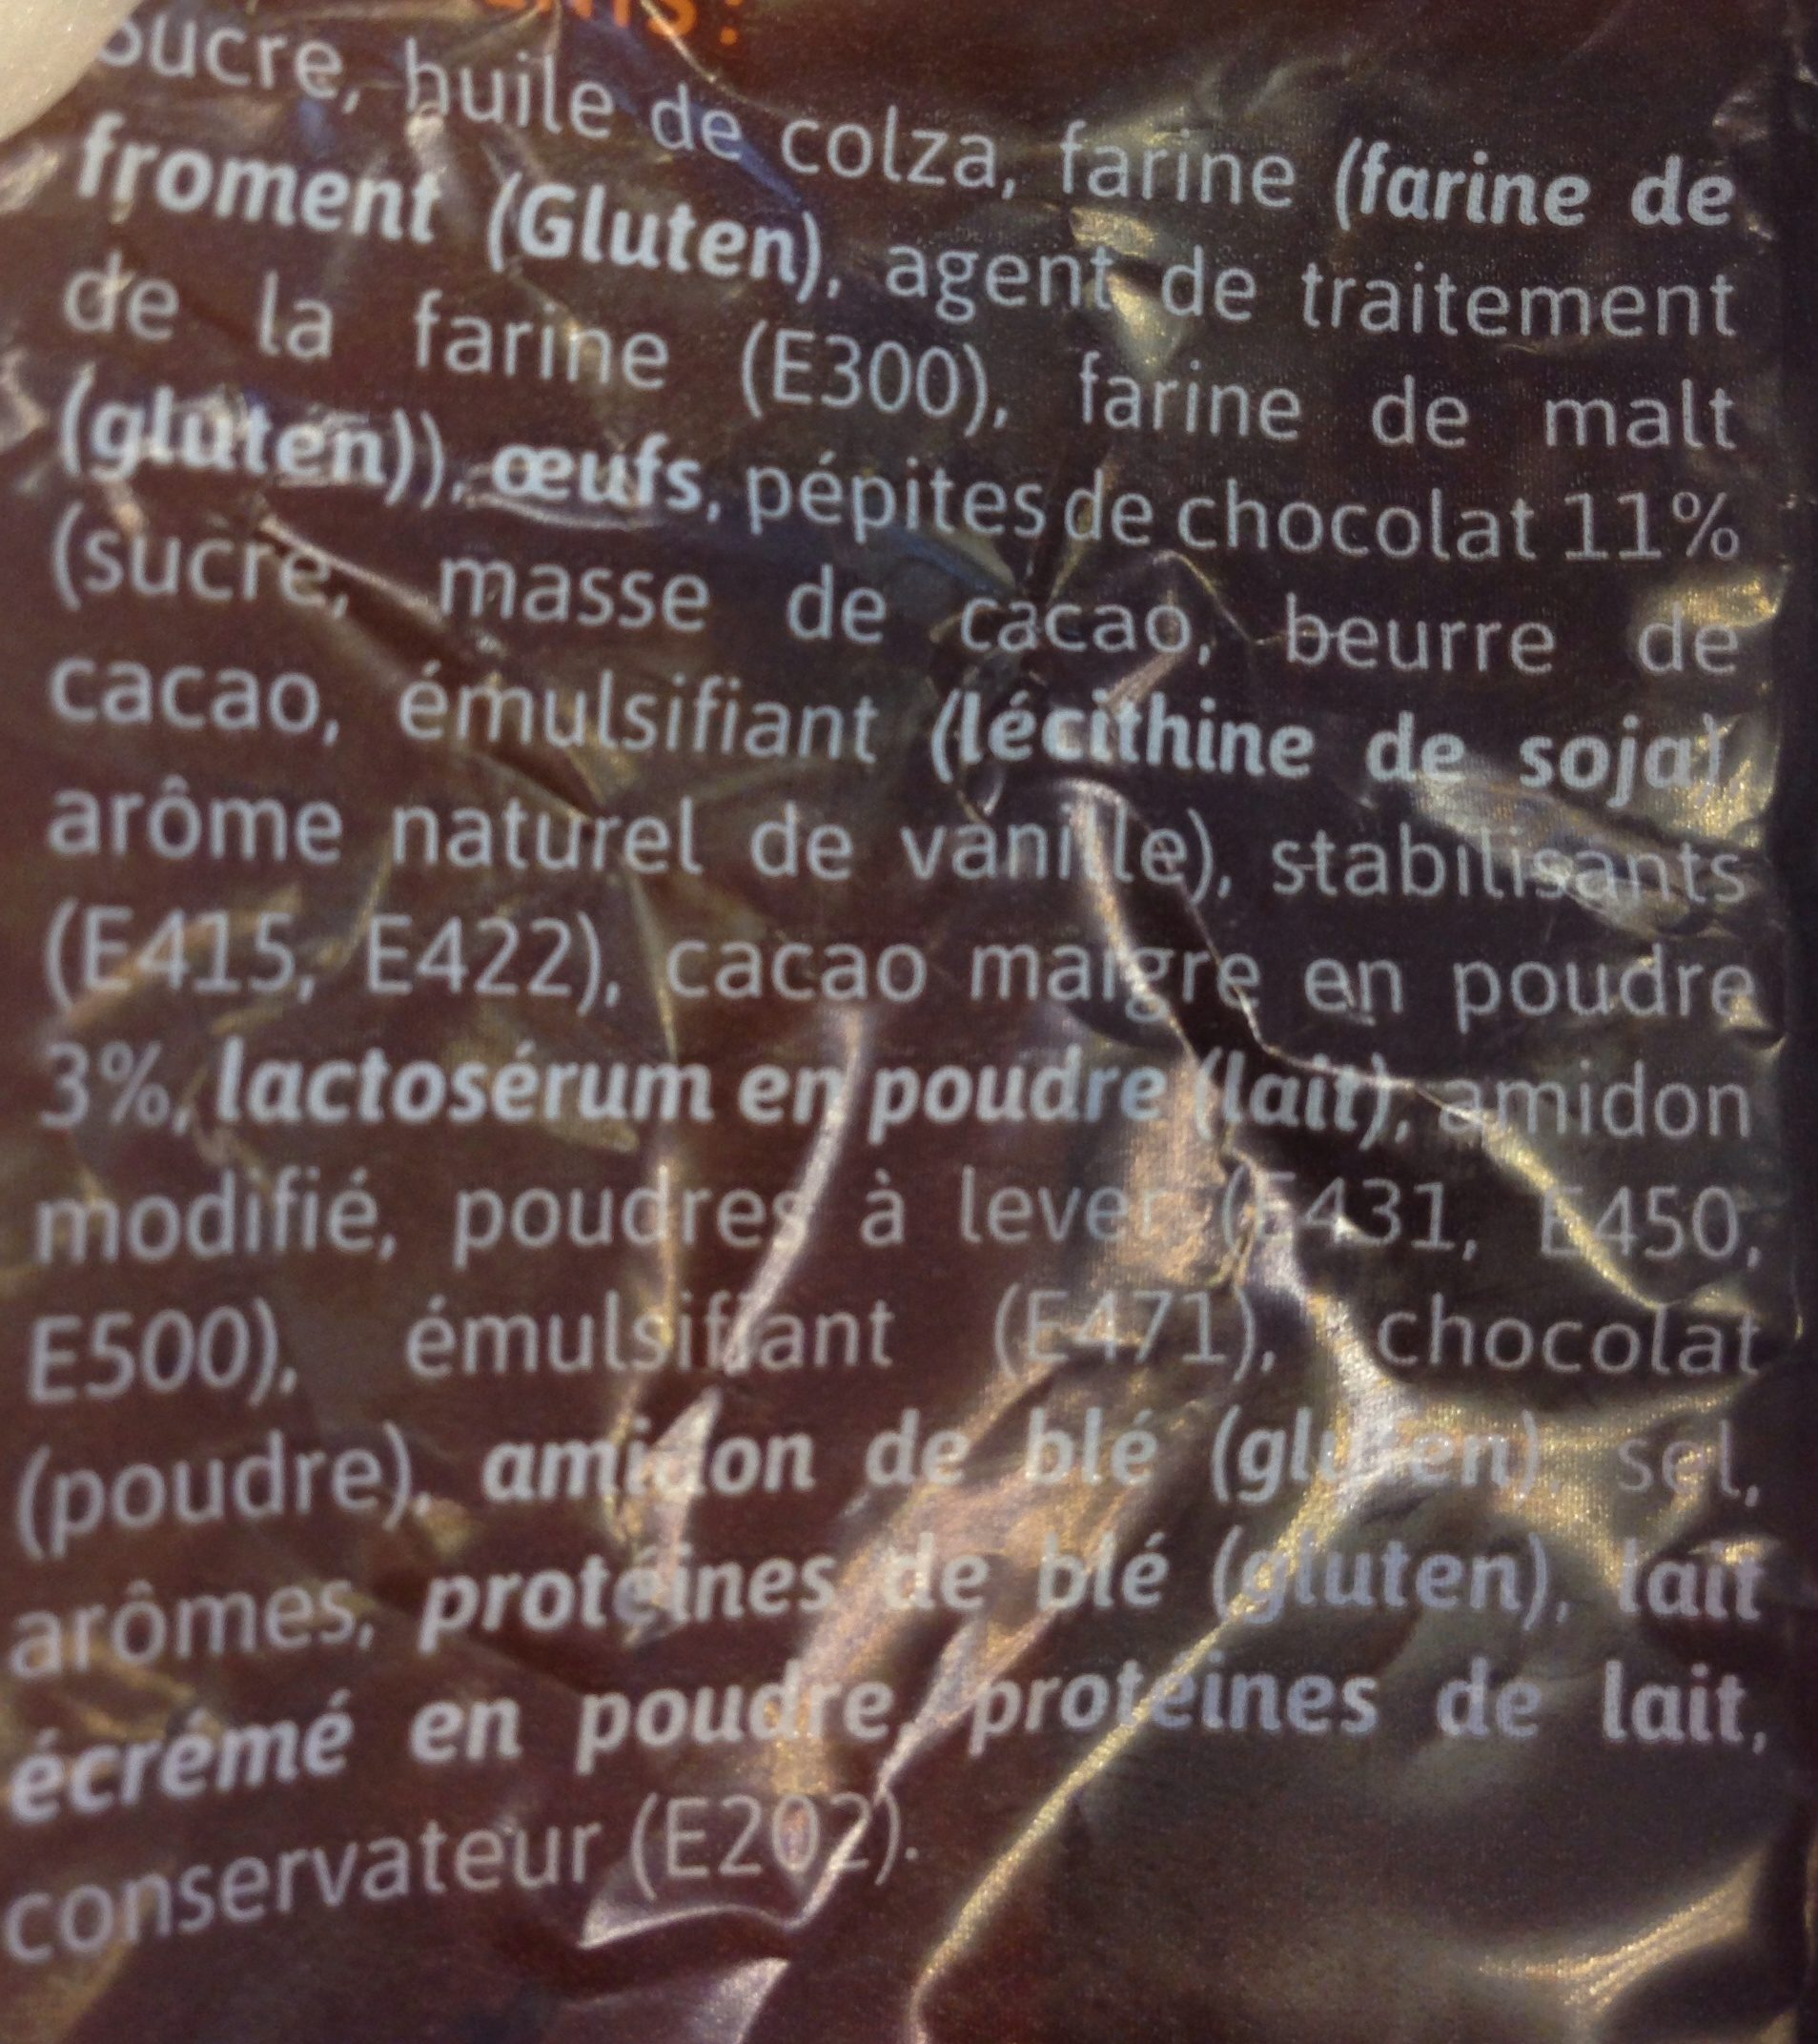 Muffin chocolat - Ingredients - fr